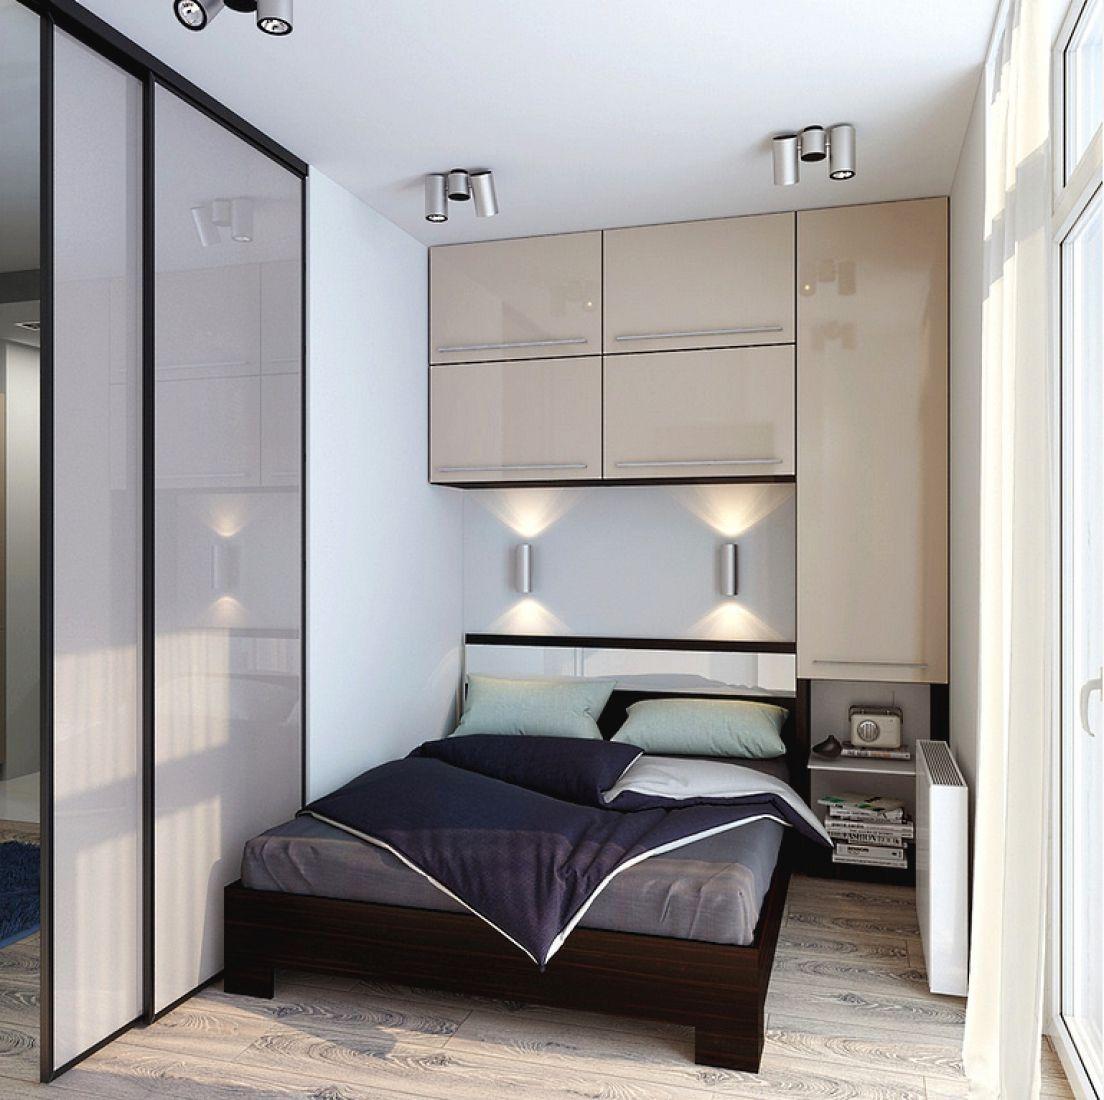 Latest Small Bedroom Ideas Uk Only On Interioropedia Com Small